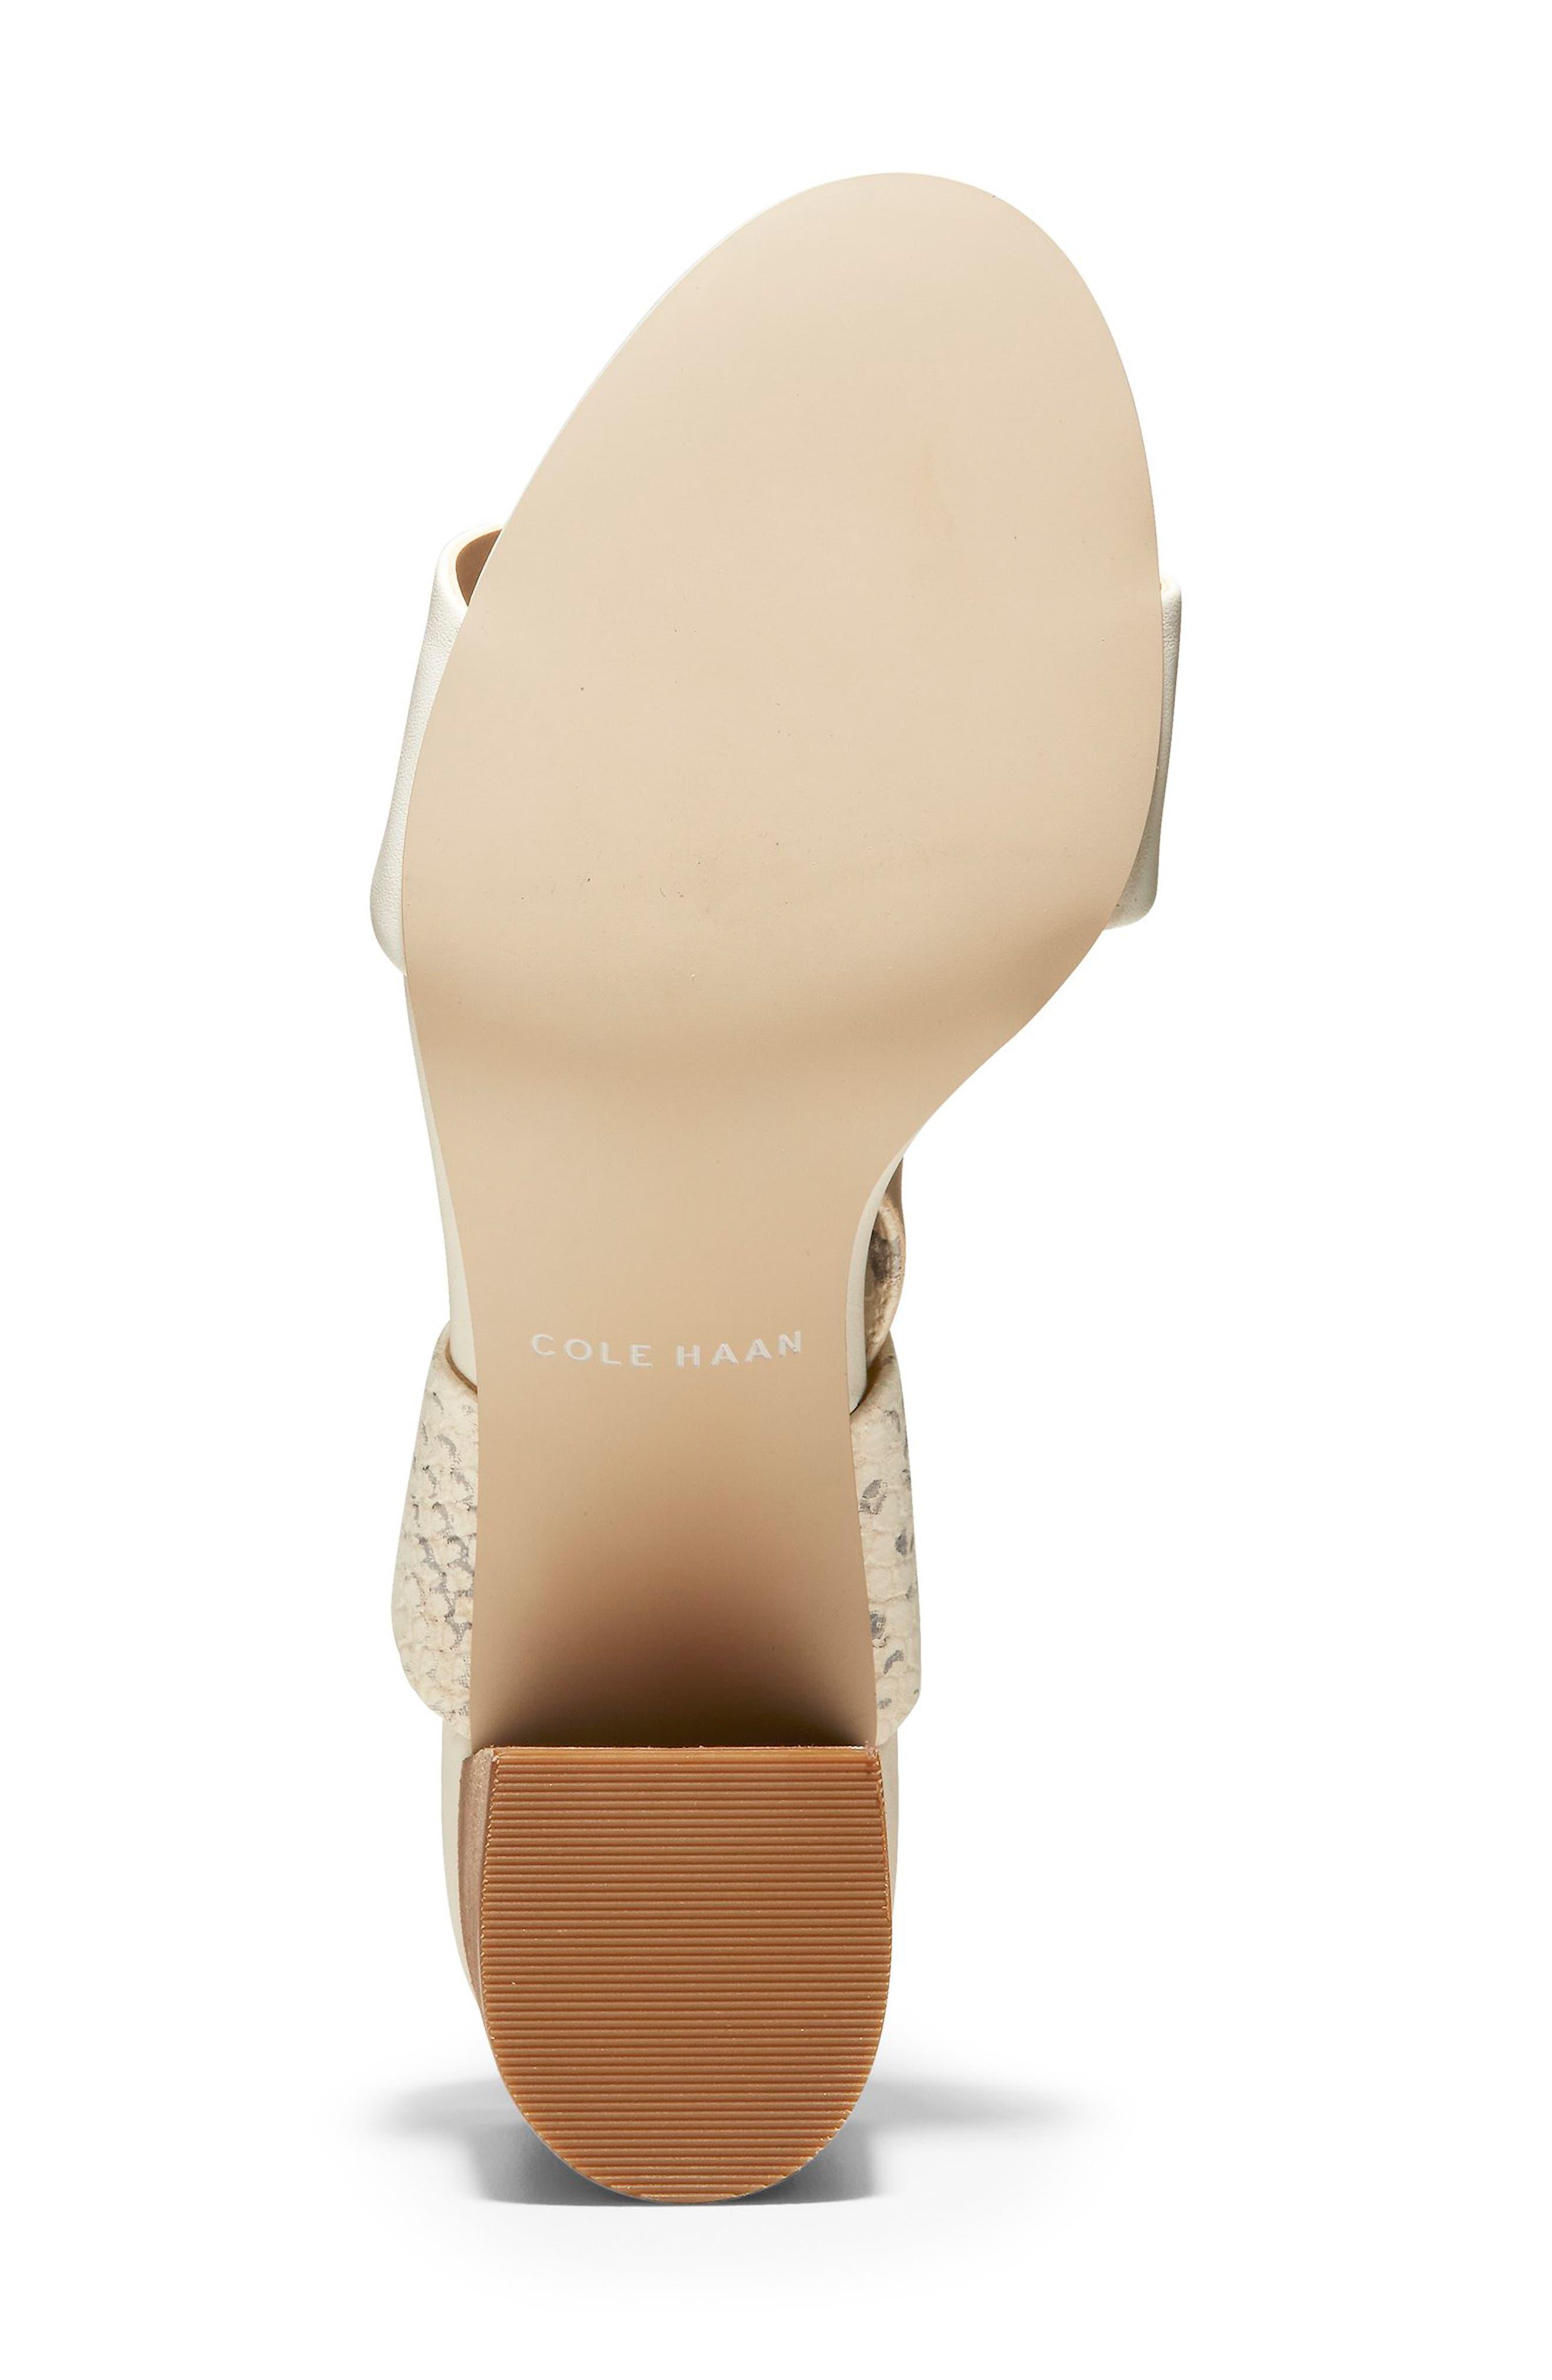 COLE HAAN, Avani Block Heel Sandal, Alternate thumbnail 6, color, IVORY PRINT LEATHER